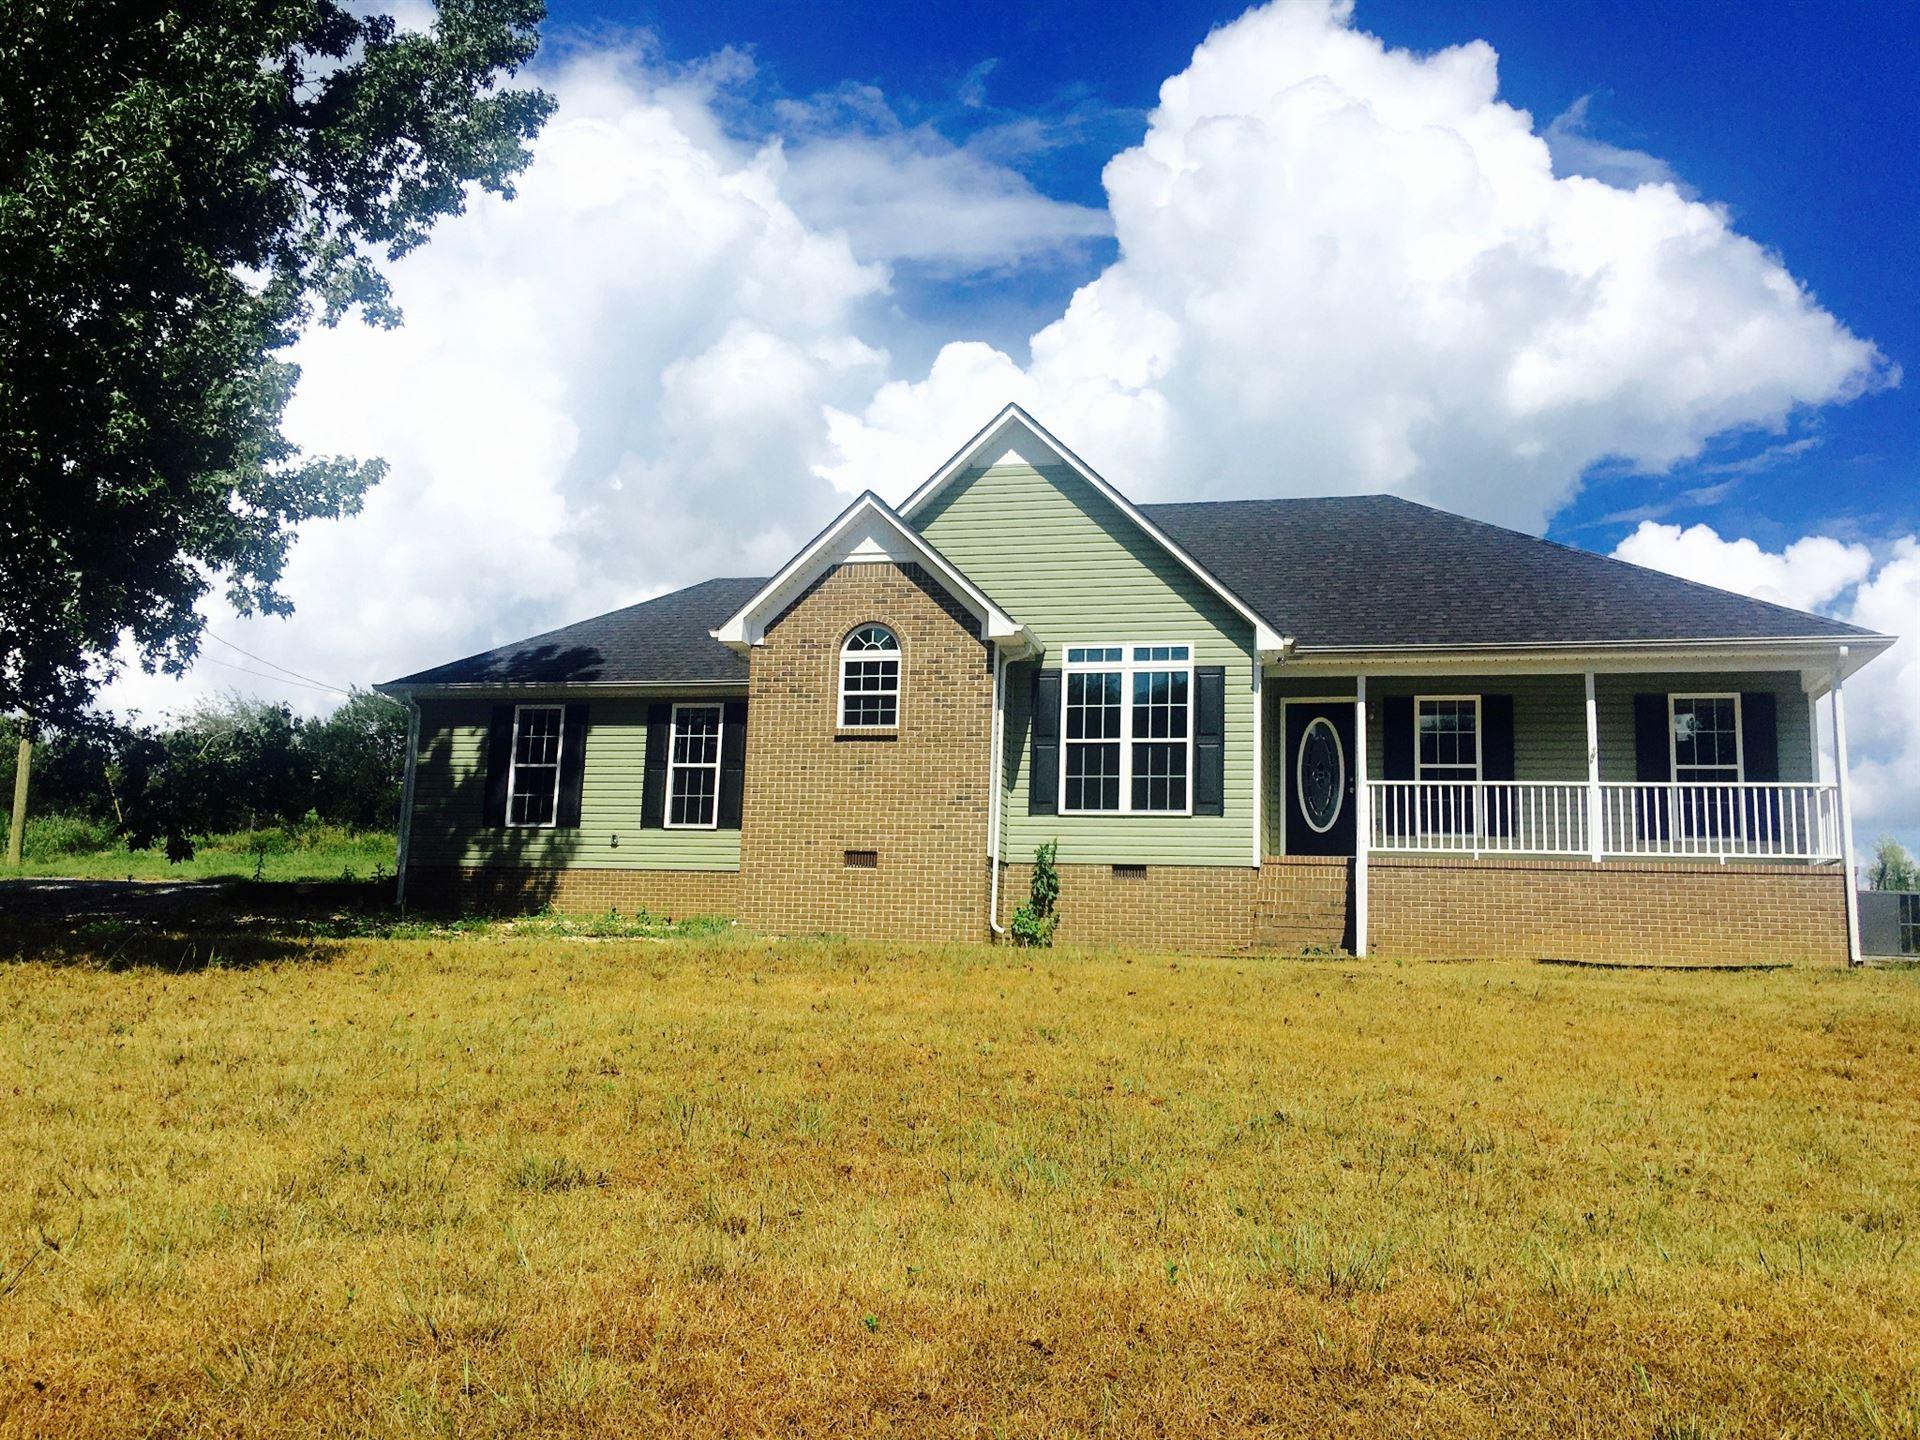 638 Oliver Smith Rd, Flintville, TN 37335 - MLS#: 2288577